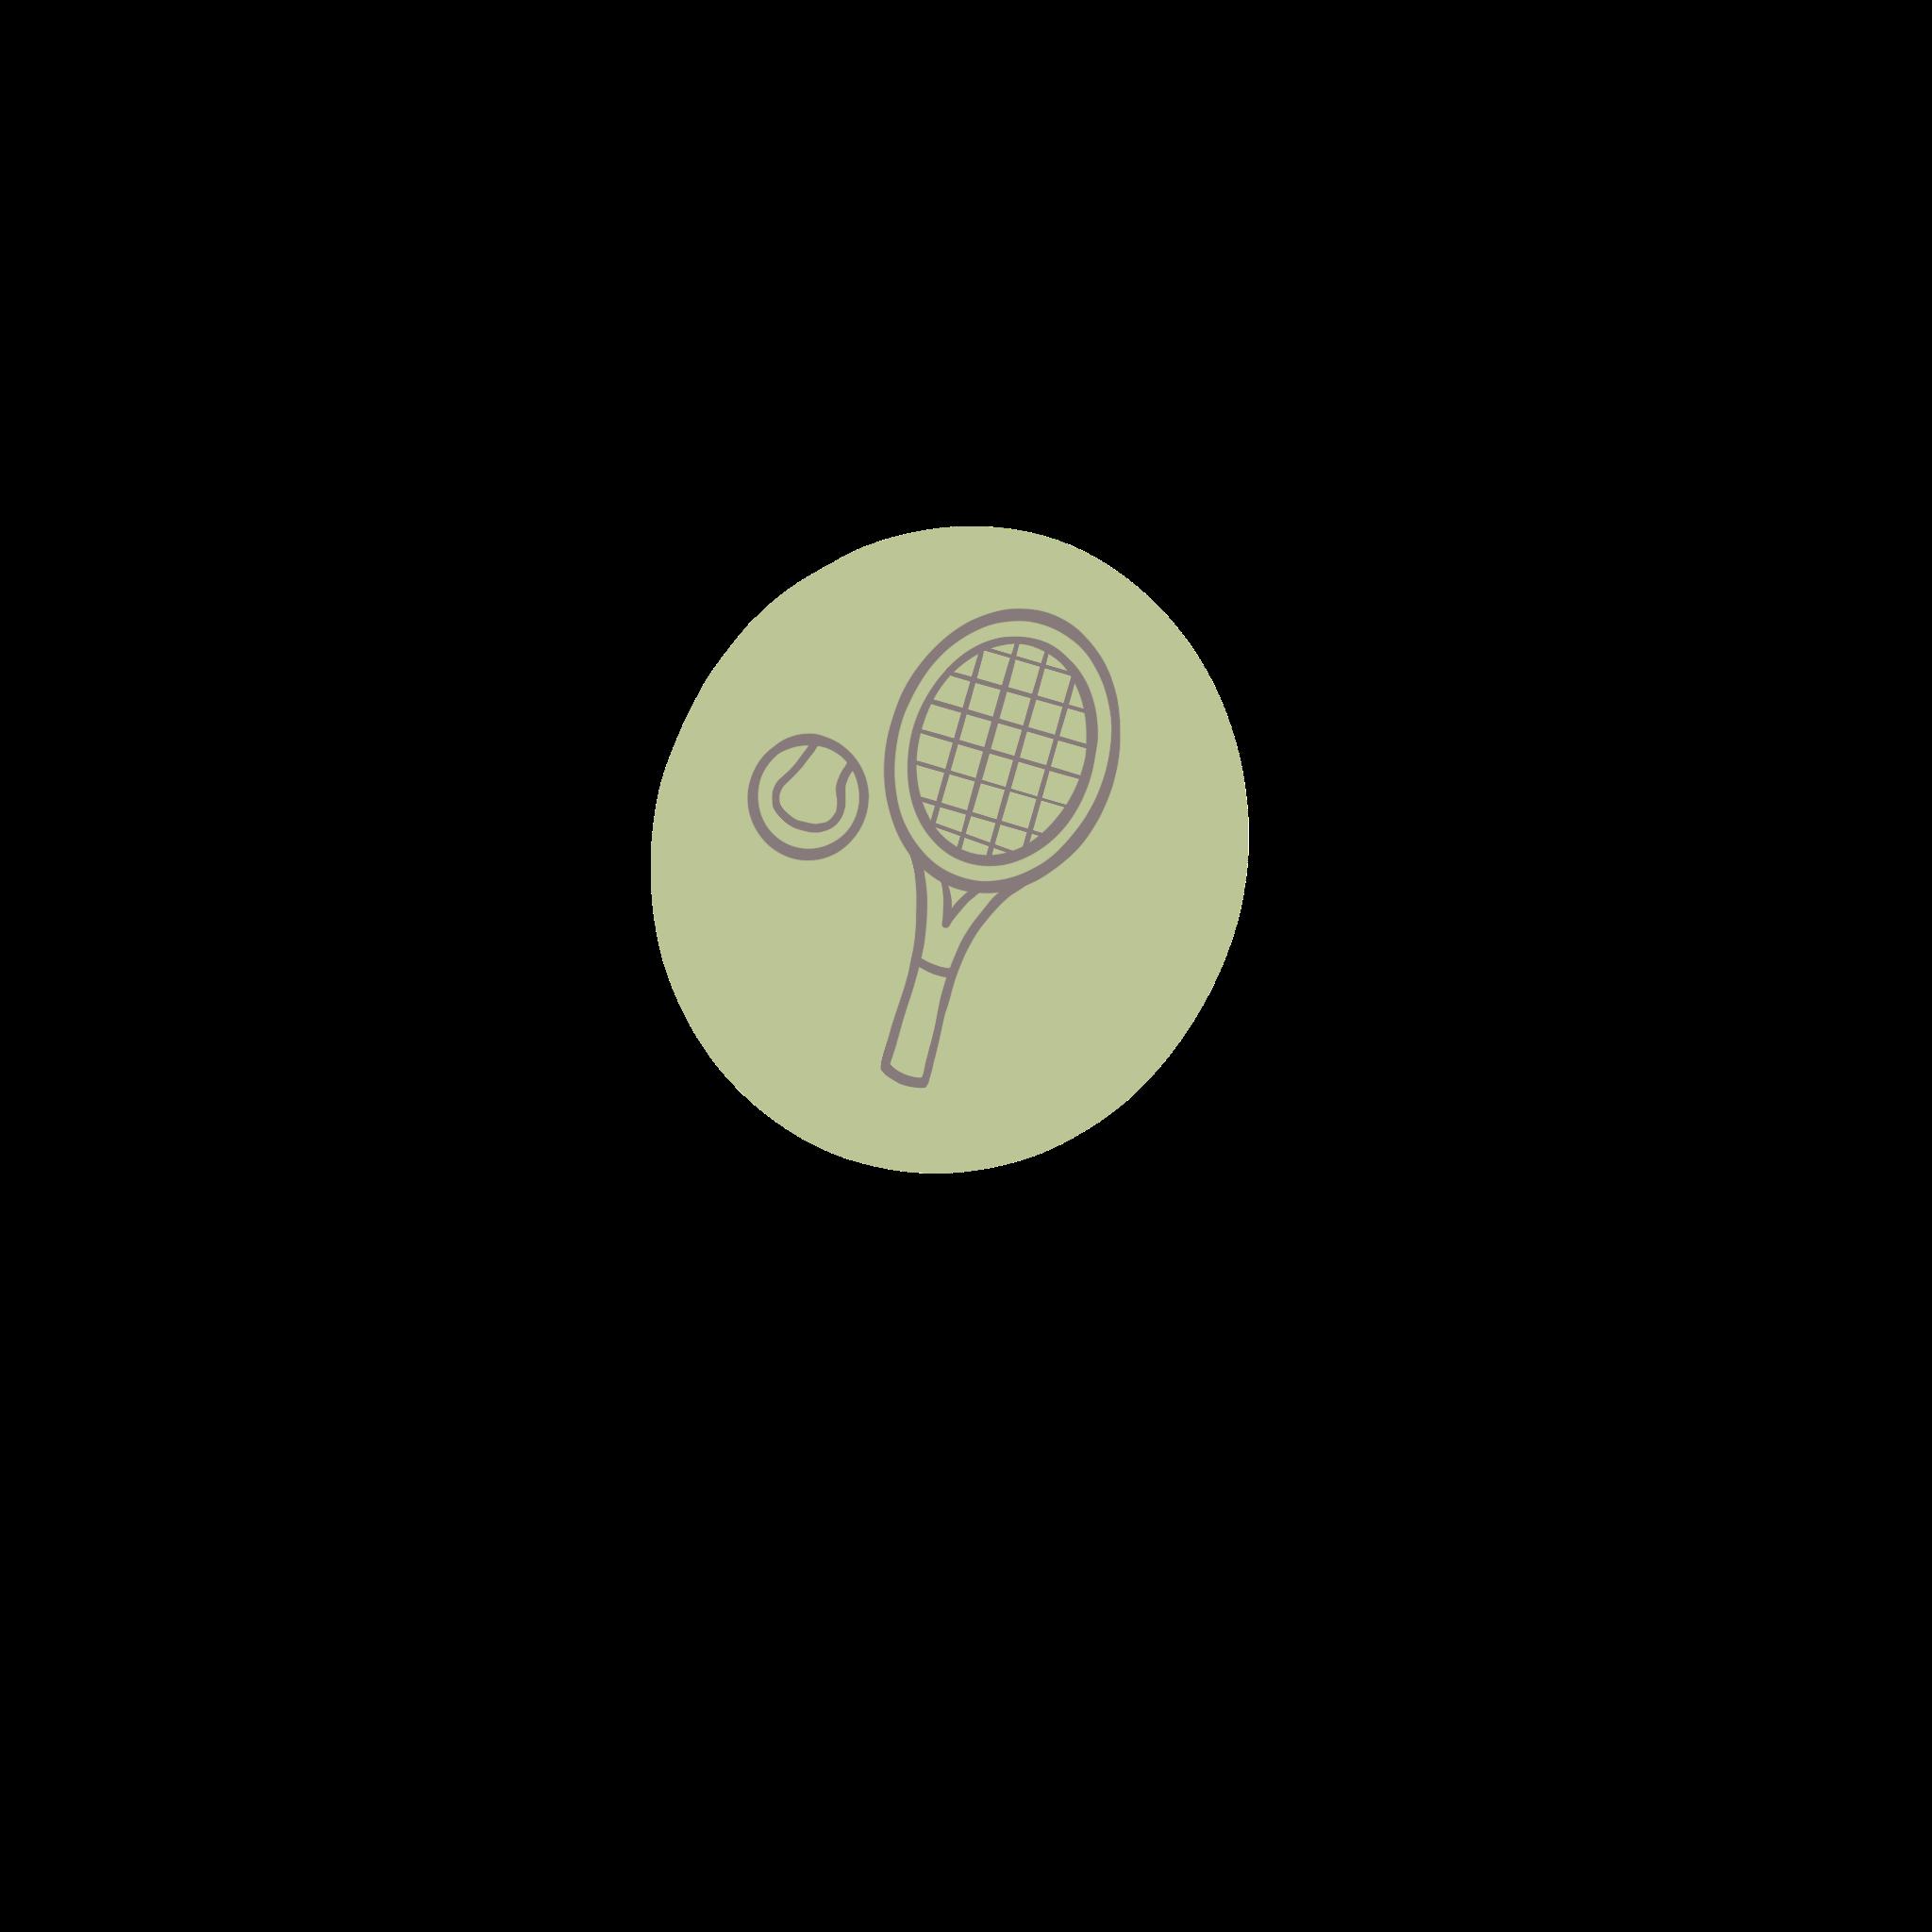 an illustration of a tennis racket